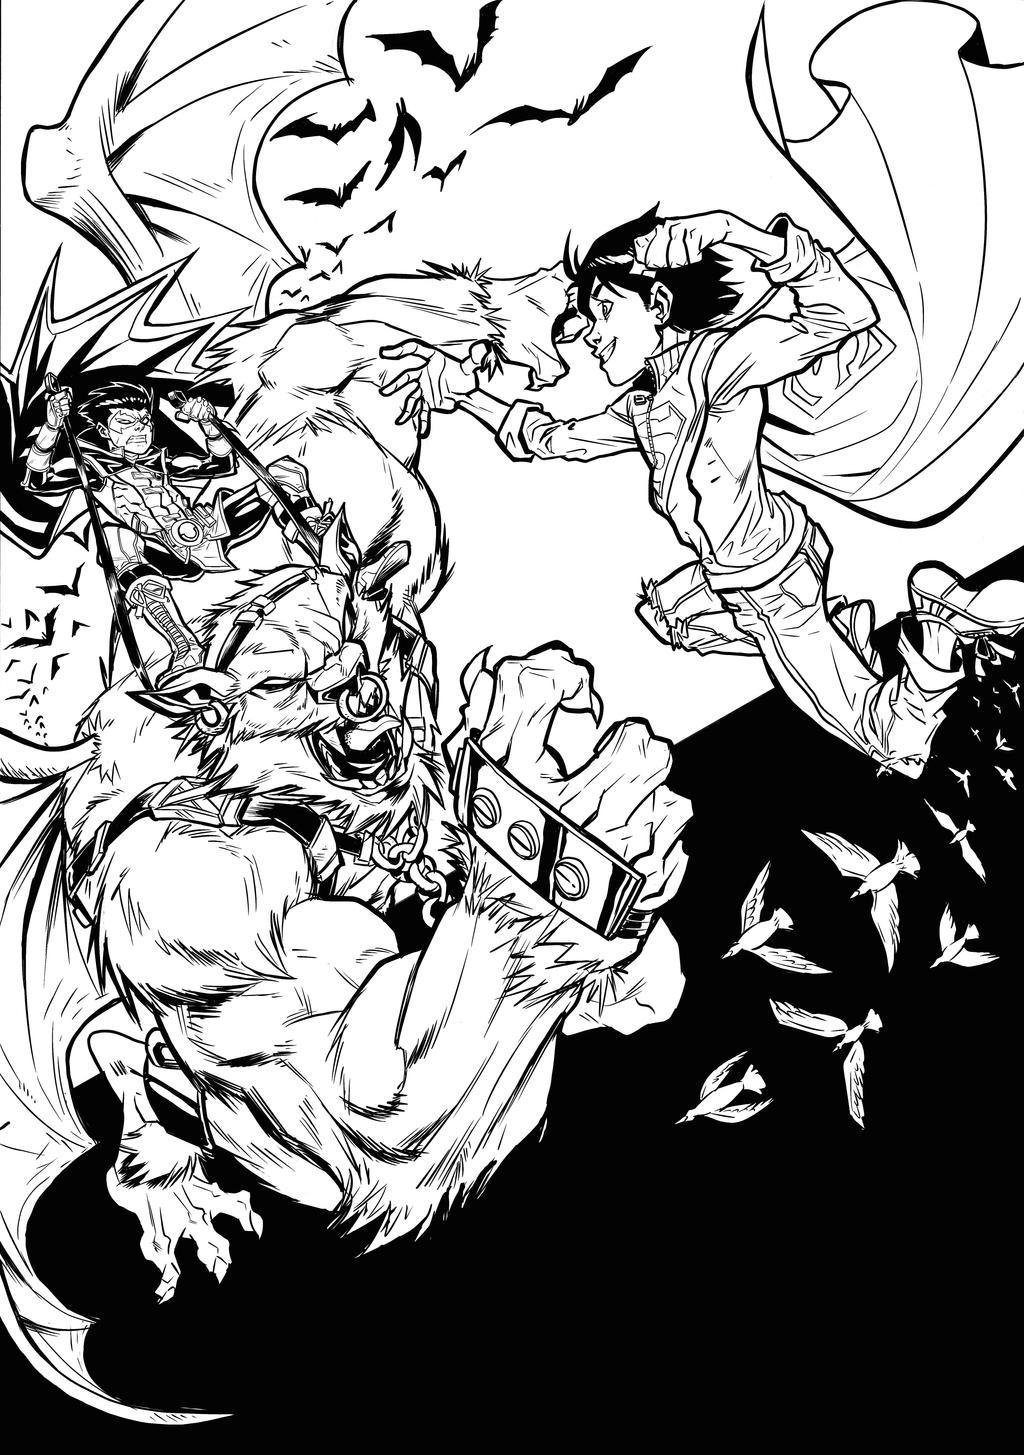 Damian VS Jon (Super Sons) - Commission by darnof